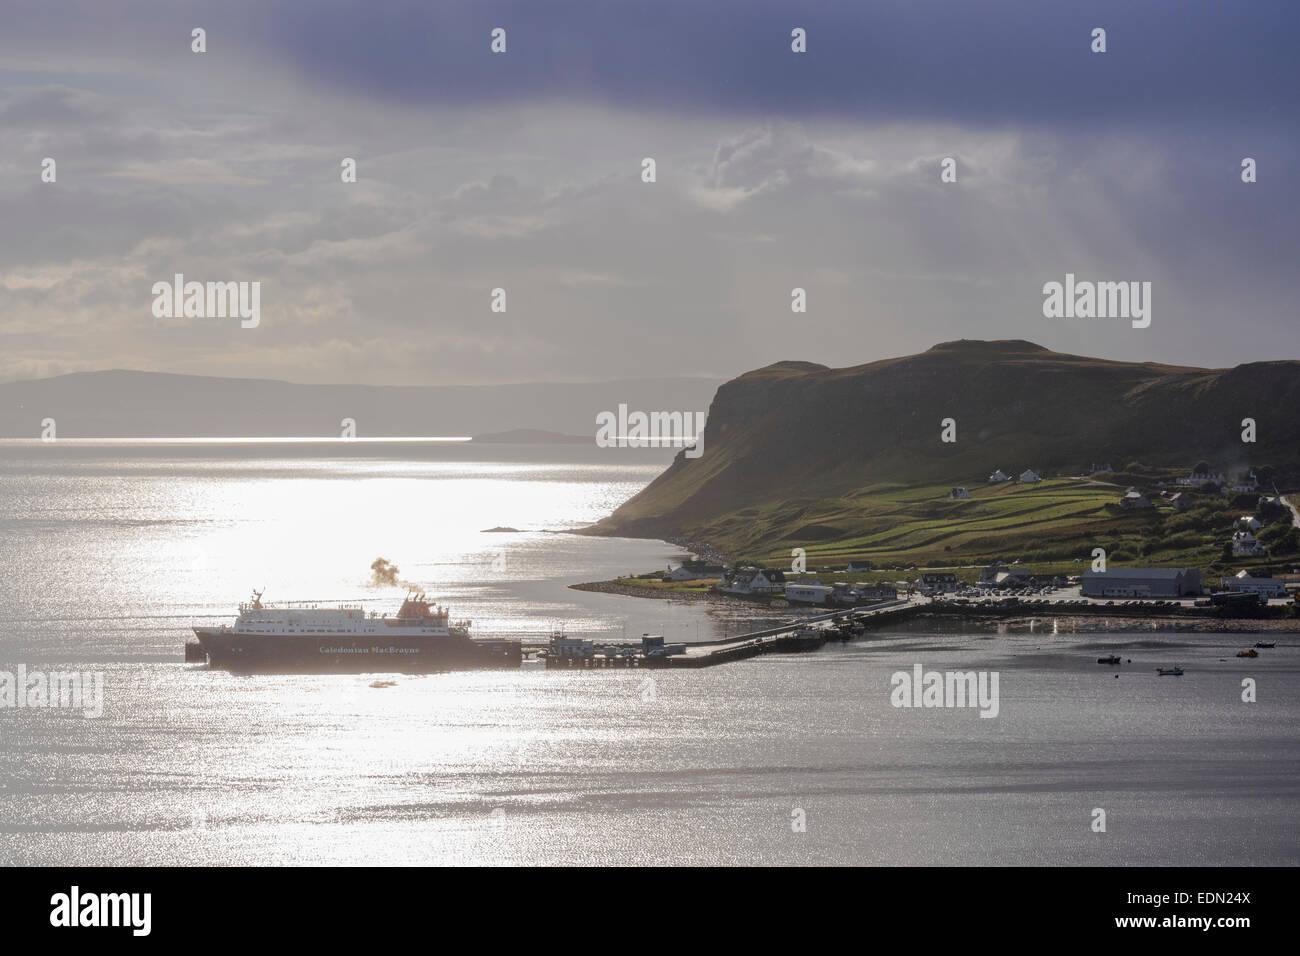 beautiful hebridean light at uig skye with calmac ferry - Stock Image